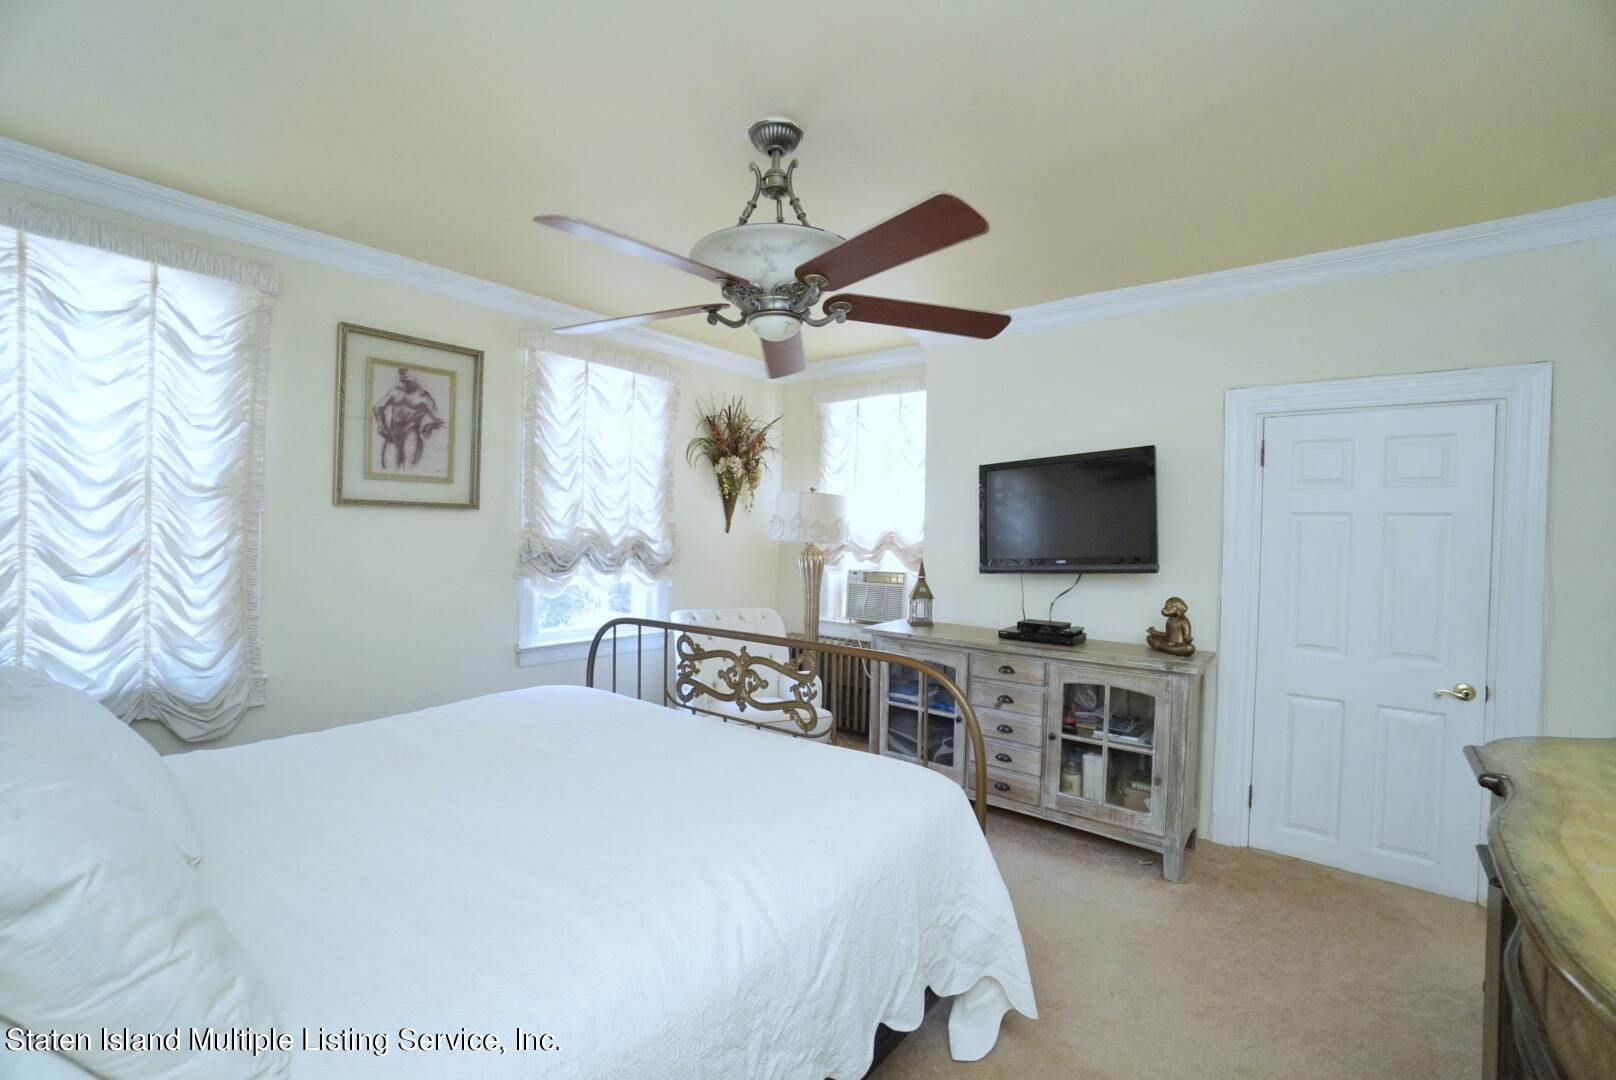 Single Family - Detached 264 Fisher Avenue  Staten Island, NY 10307, MLS-1146898-28